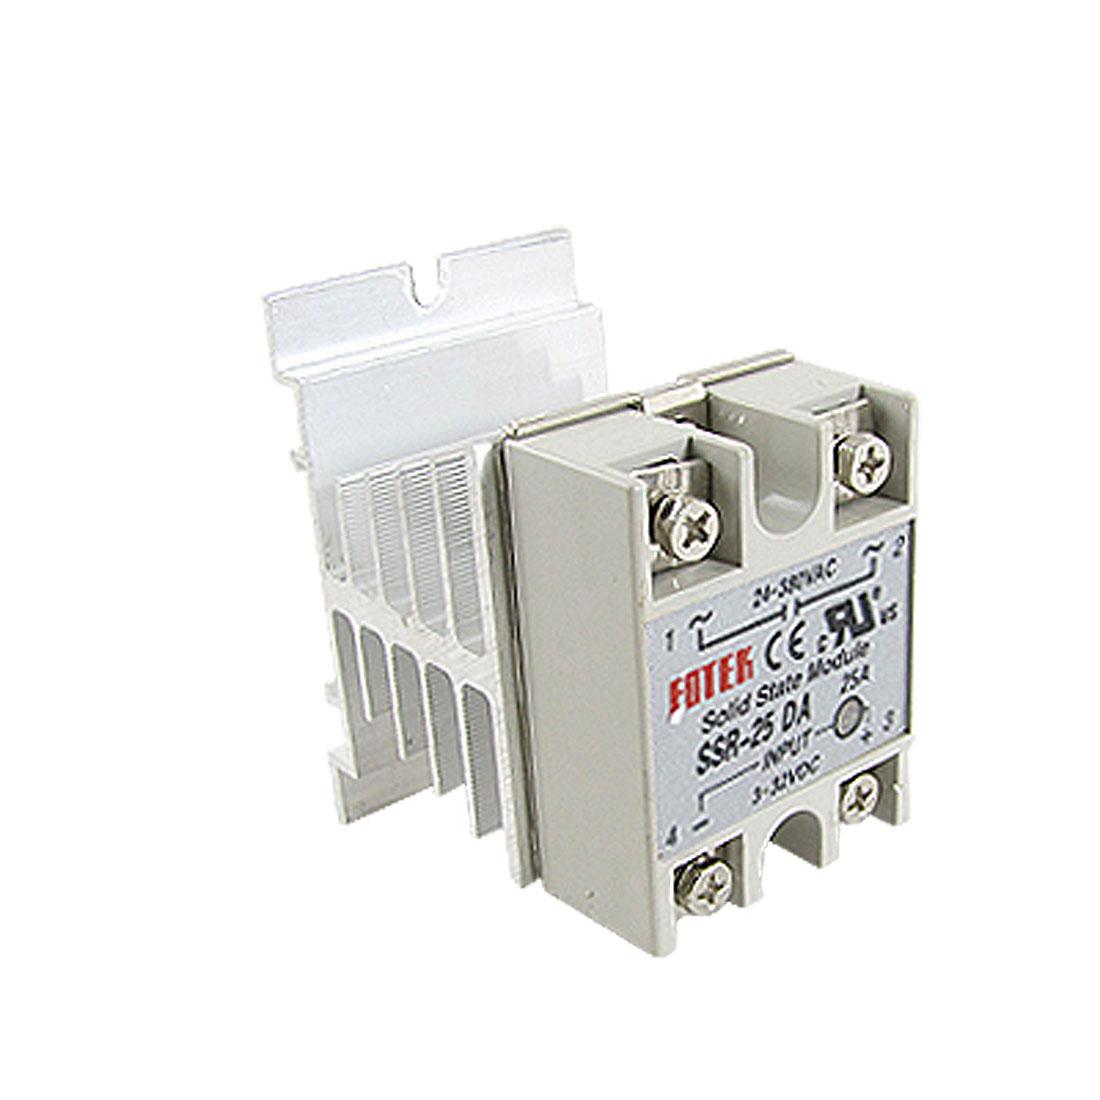 SSR 25A Solid State Relay 3-32V DC 24-380V AC Control w Heat Sink